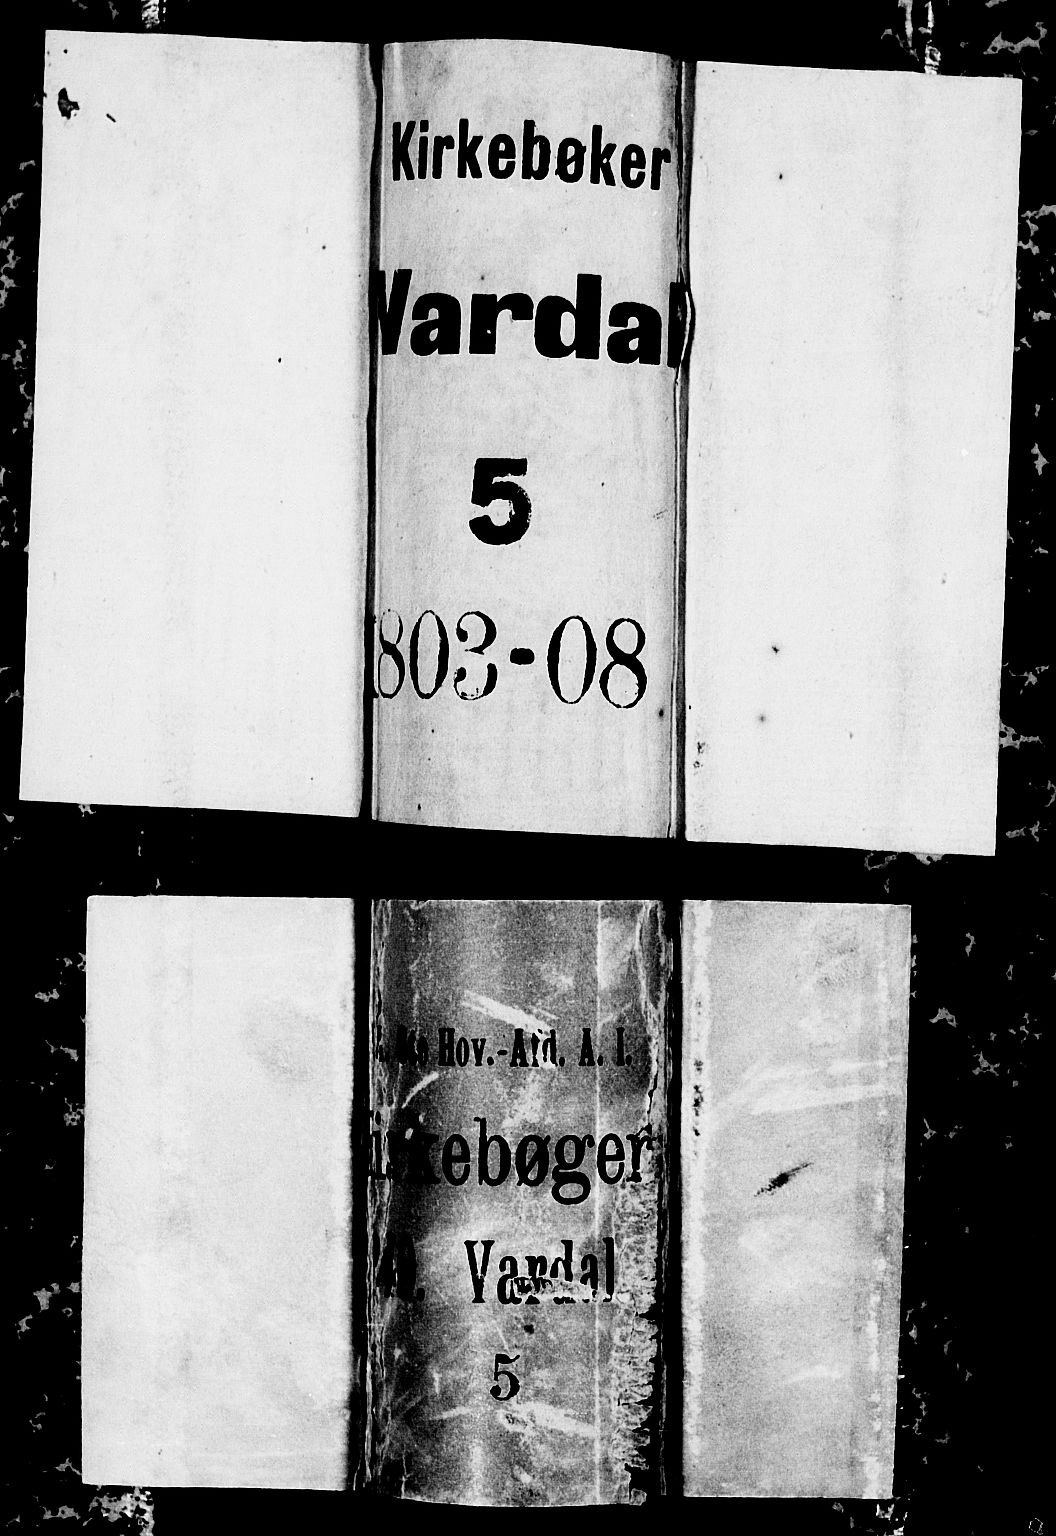 SAH, Vardal prestekontor, H/Ha/Hab/L0003: Klokkerbok nr. 3, 1803-1808